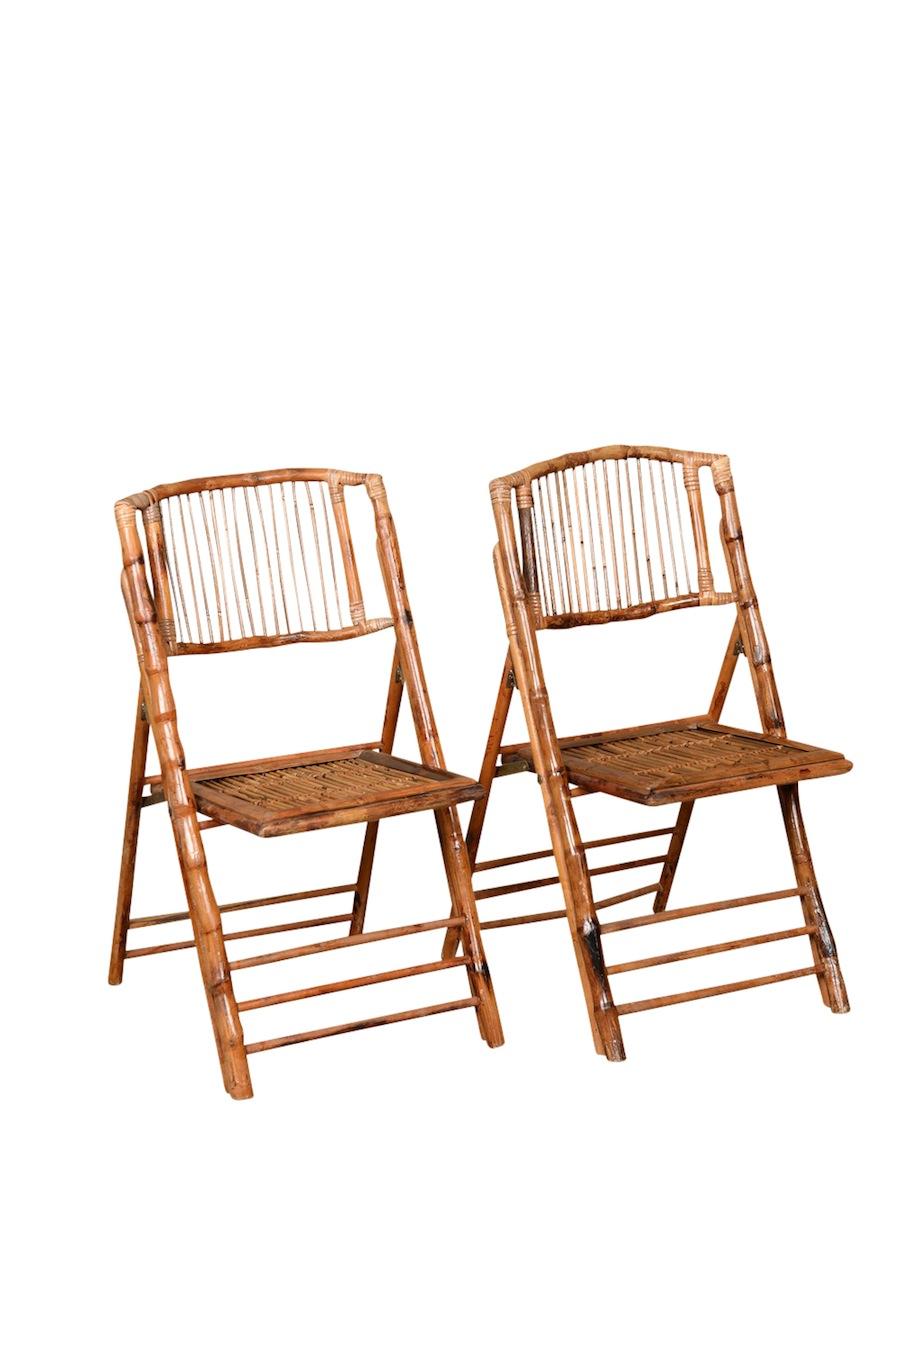 Palma Folding Chairs Found Rentals